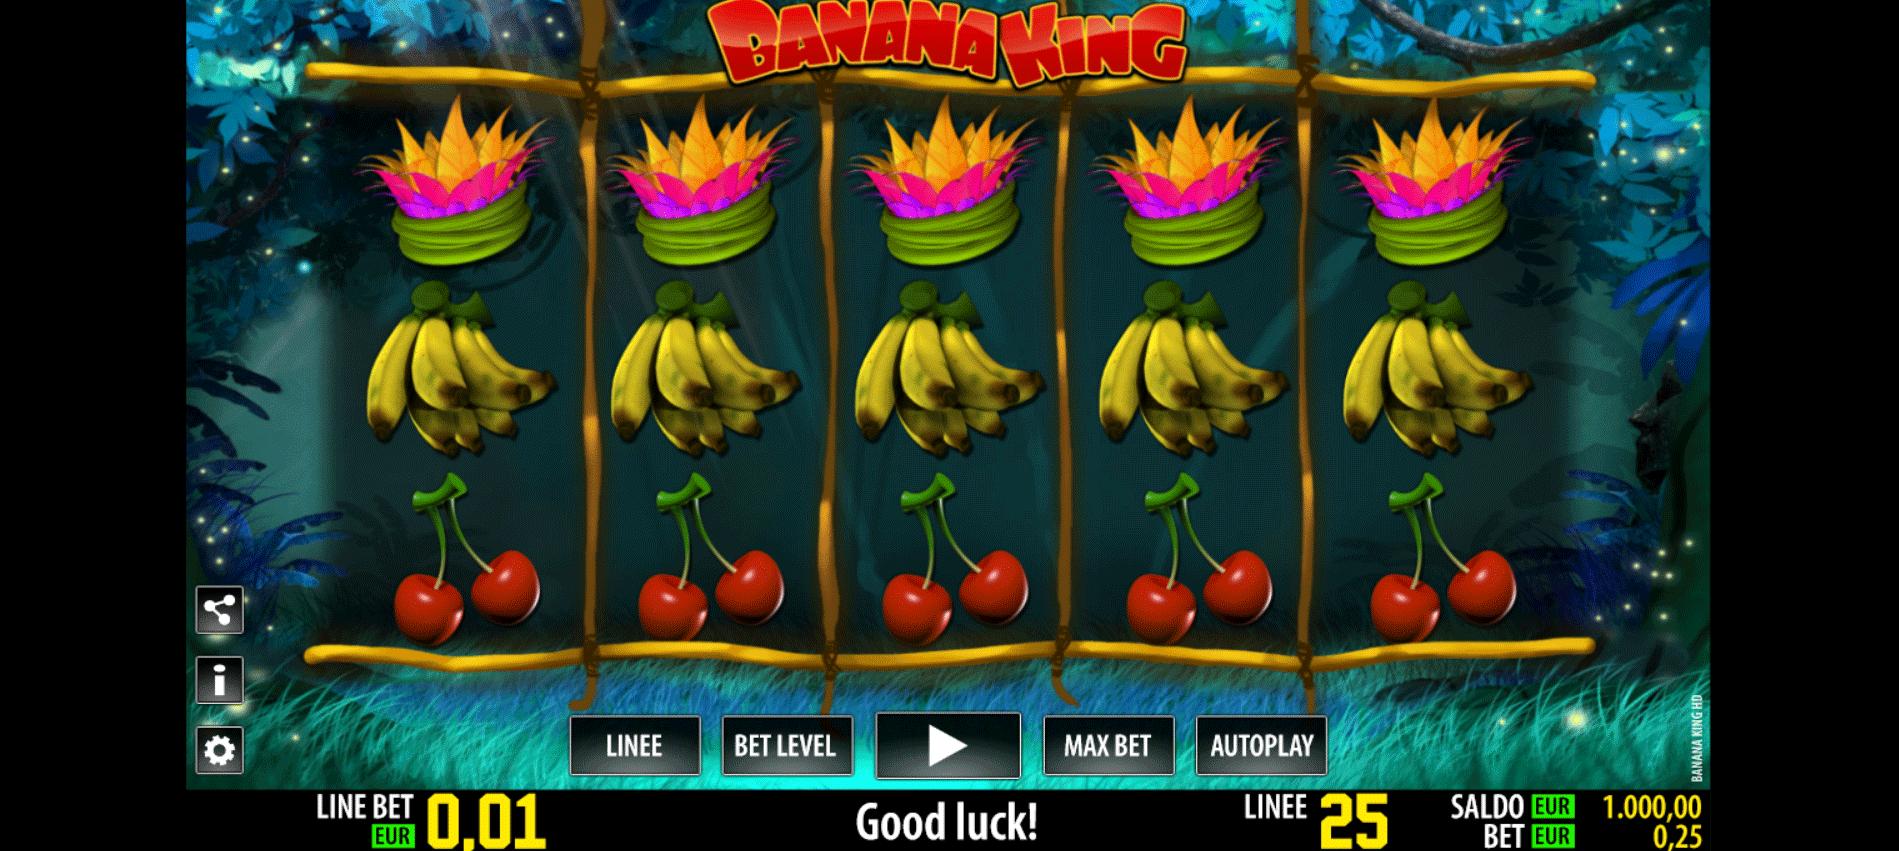 Slot Banana King